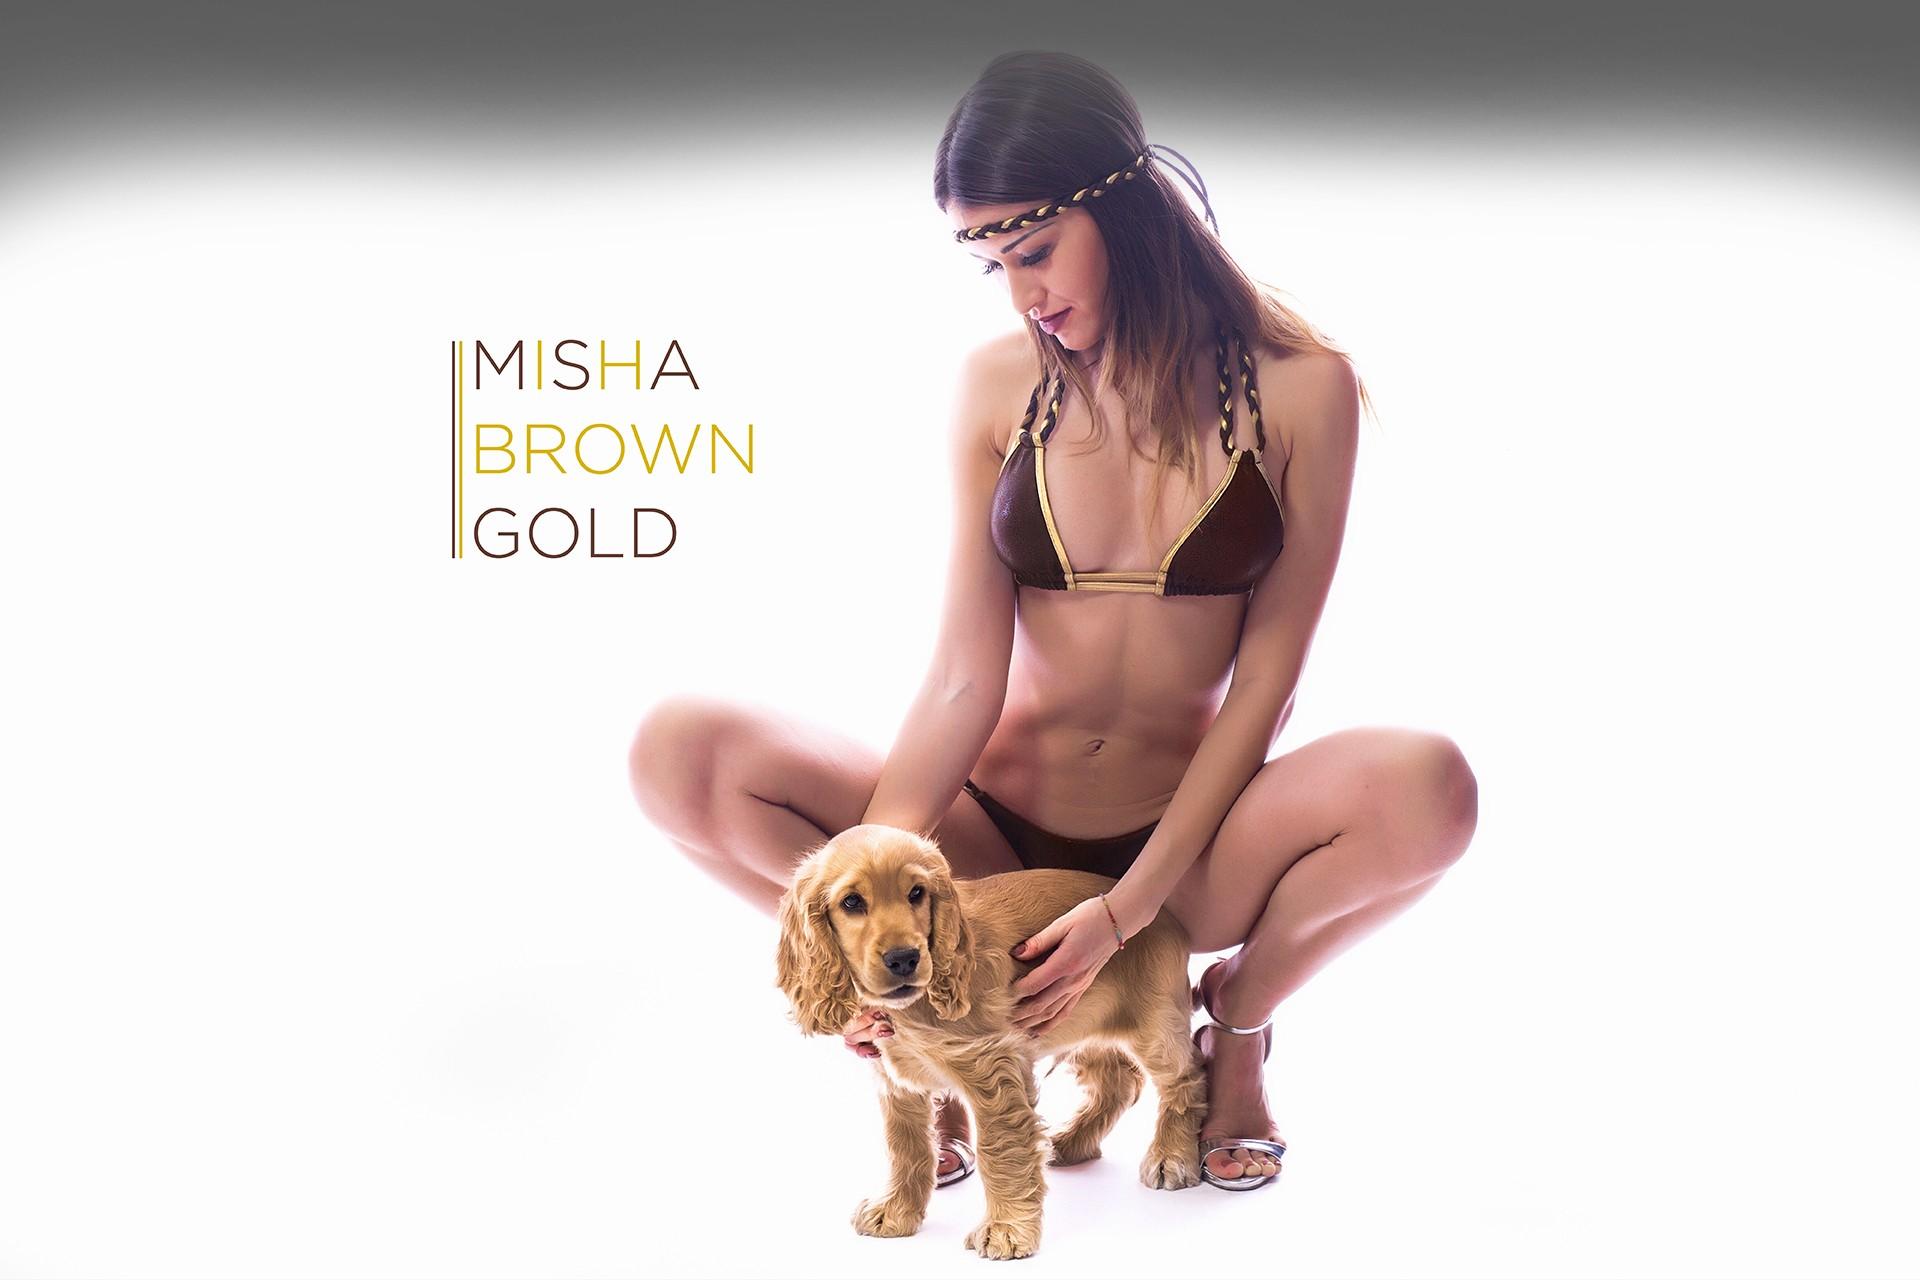 MISHA BROWN&GOLD